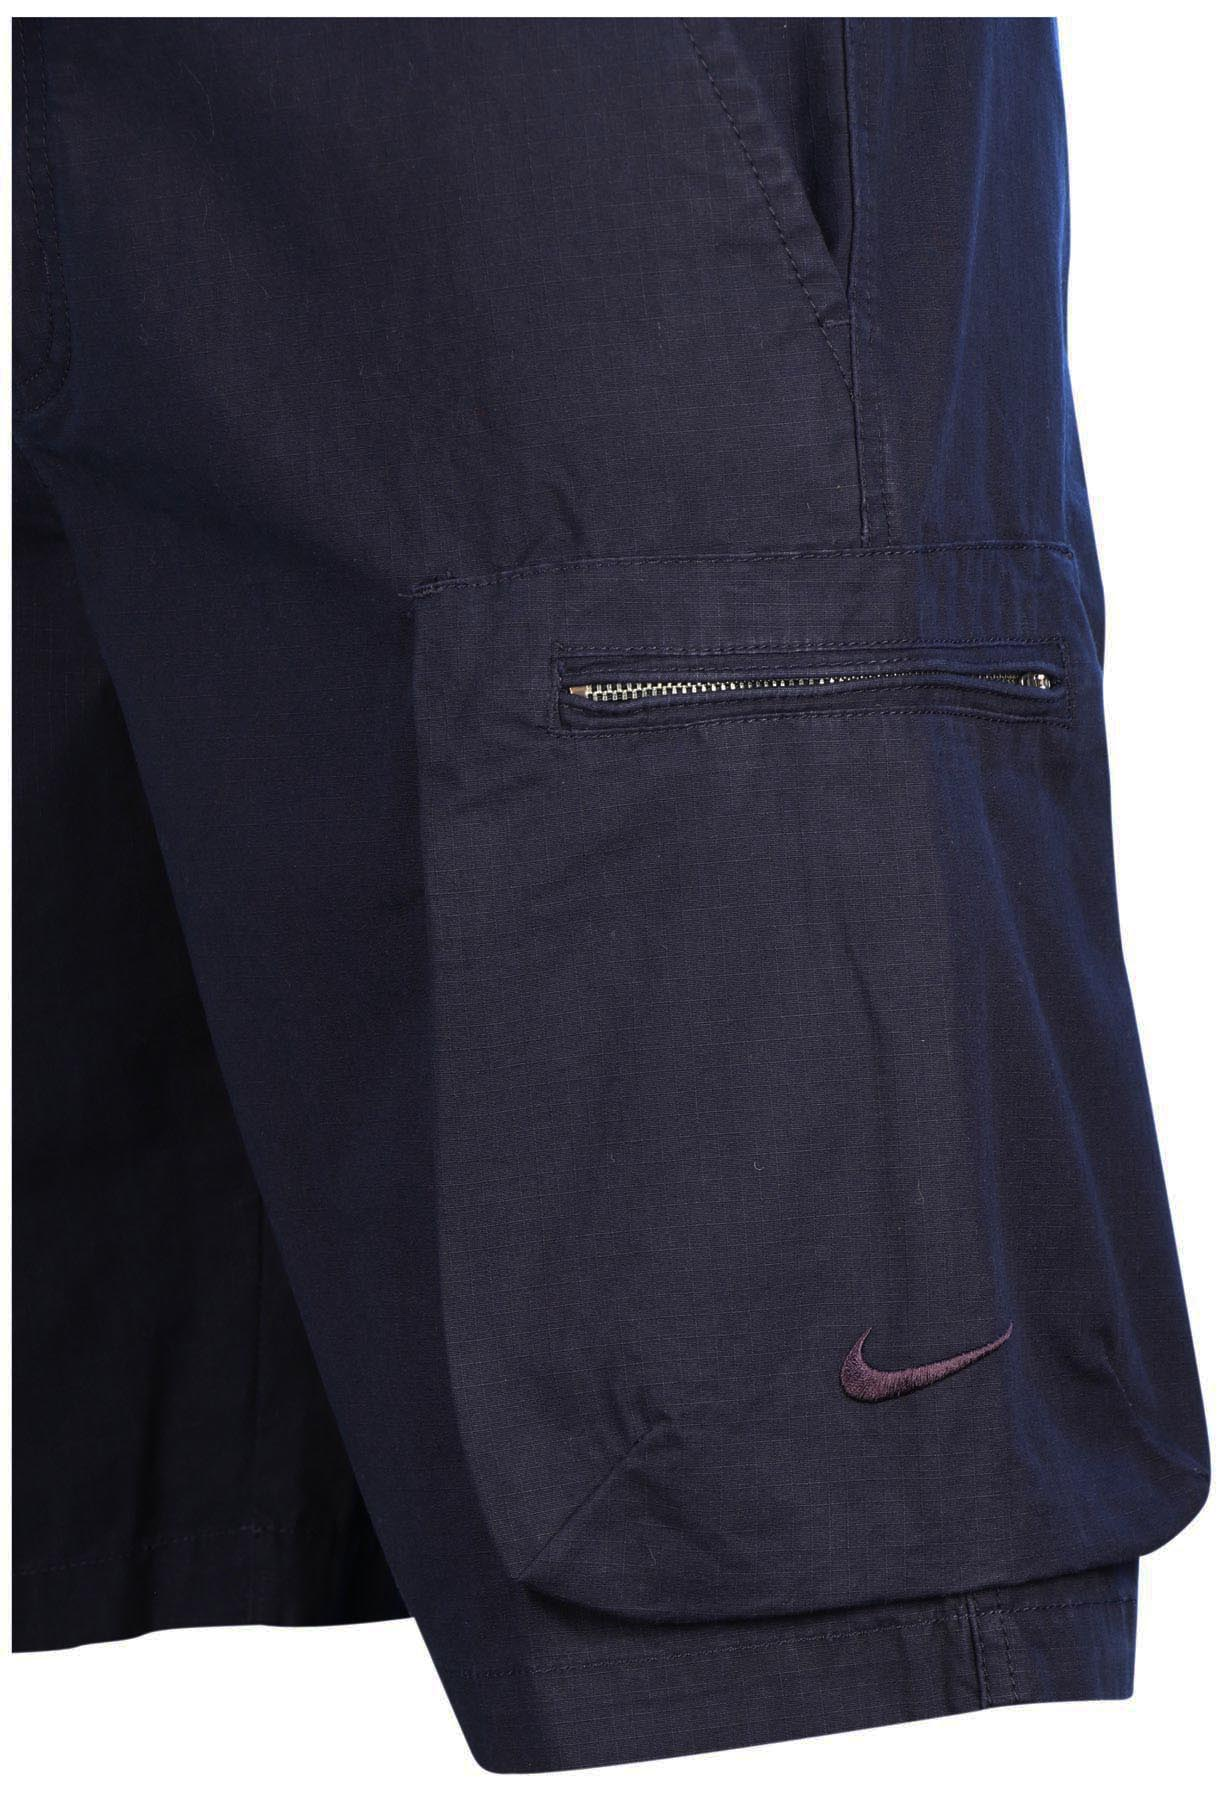 Nike Men's Woven Performance Cargo Shorts | eBay